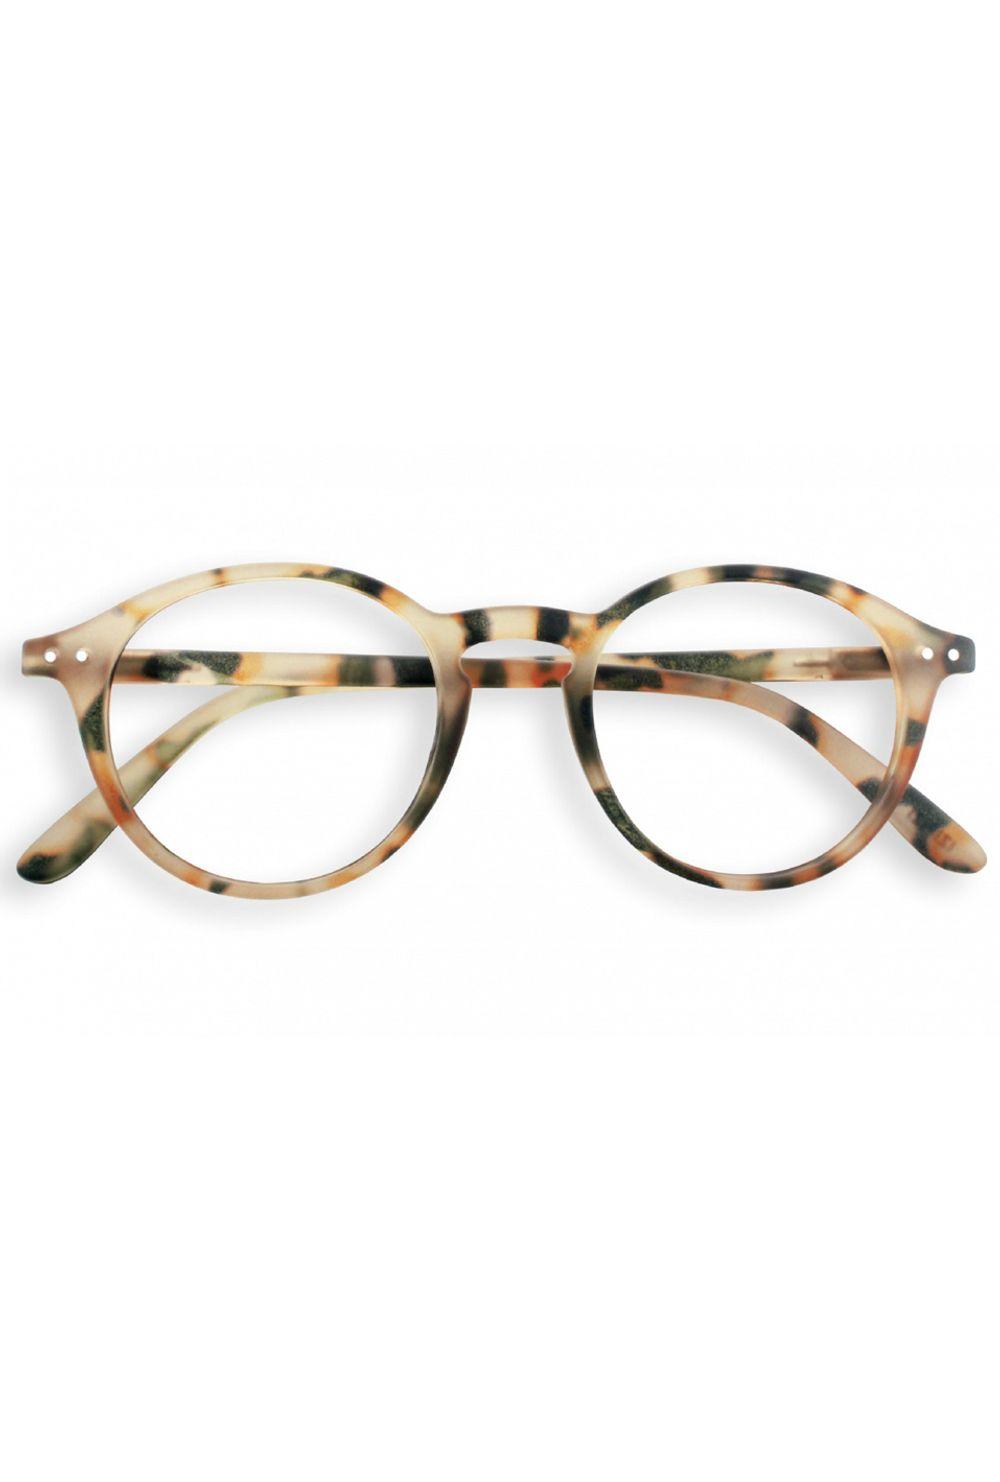 4808bfb6232ee Óculos Reading D Night Tortoise - Mobile